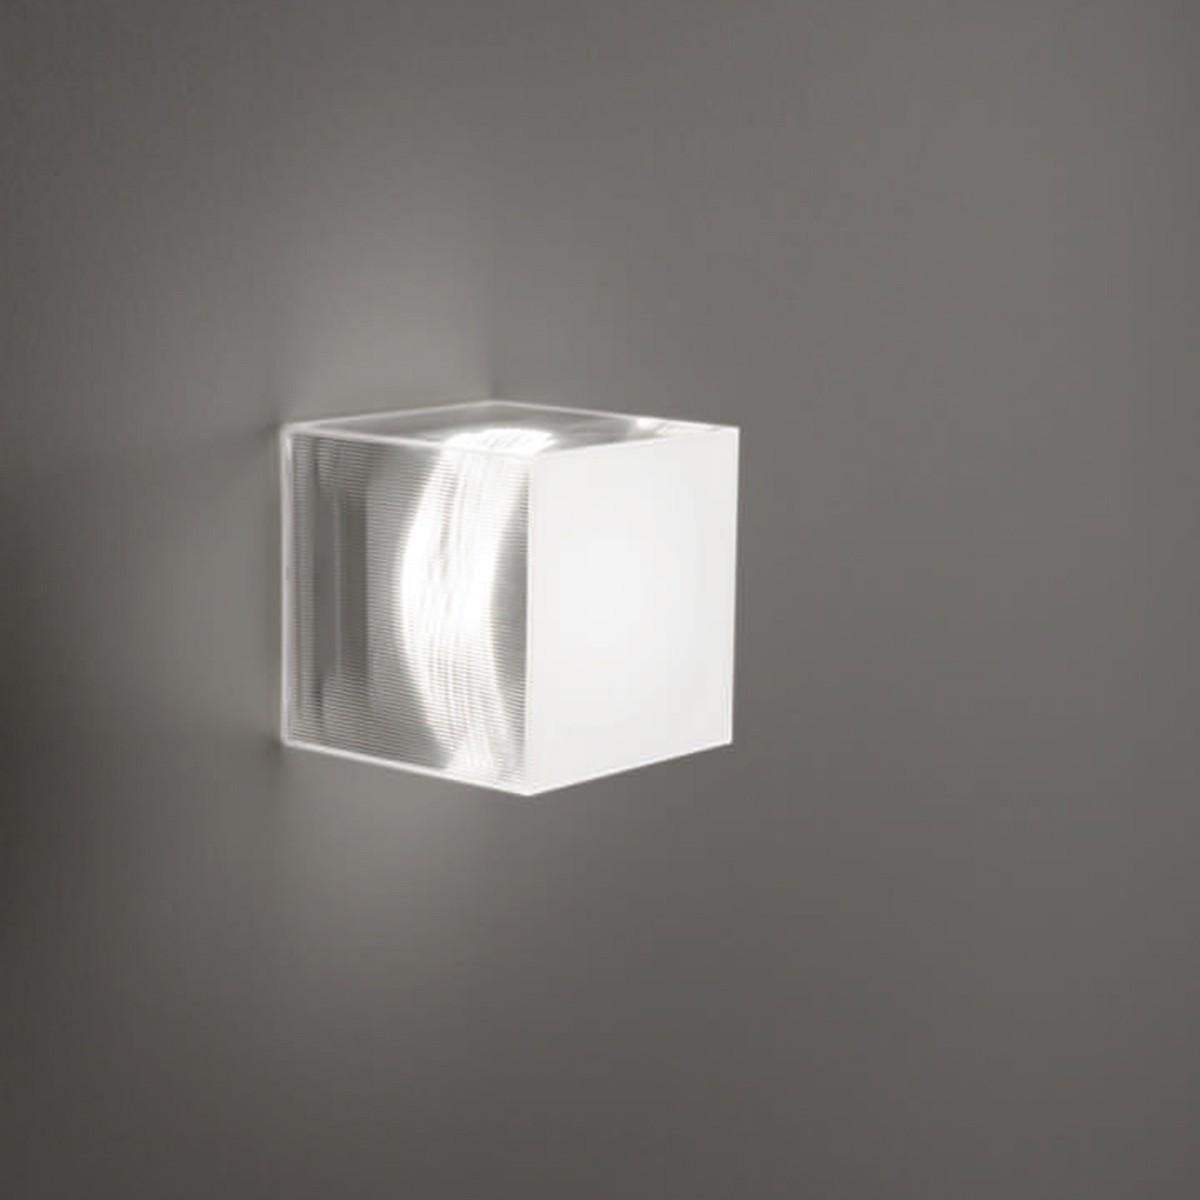 Studio Italia Design Beetle Cube Wand- / Deckenleuchte, Mini, weiß / transparent